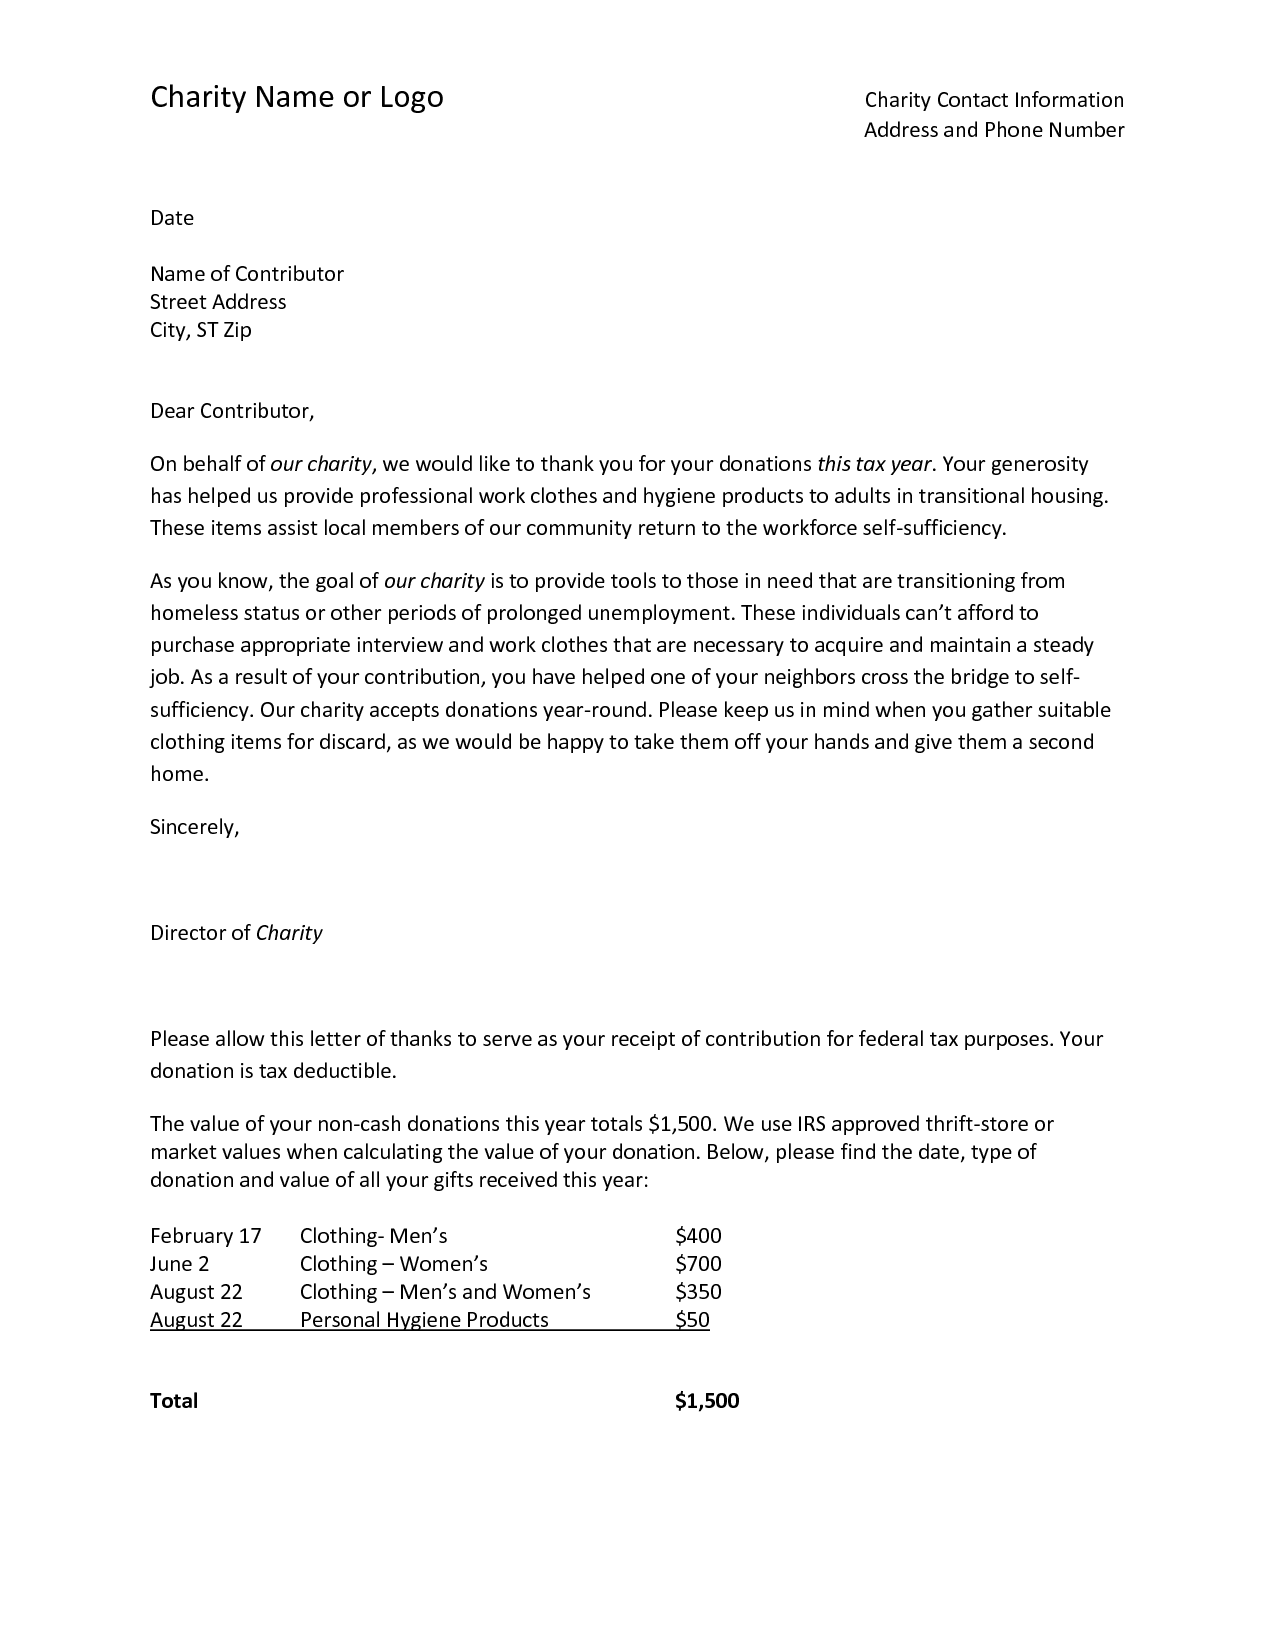 Cash Donation Thank You Letter